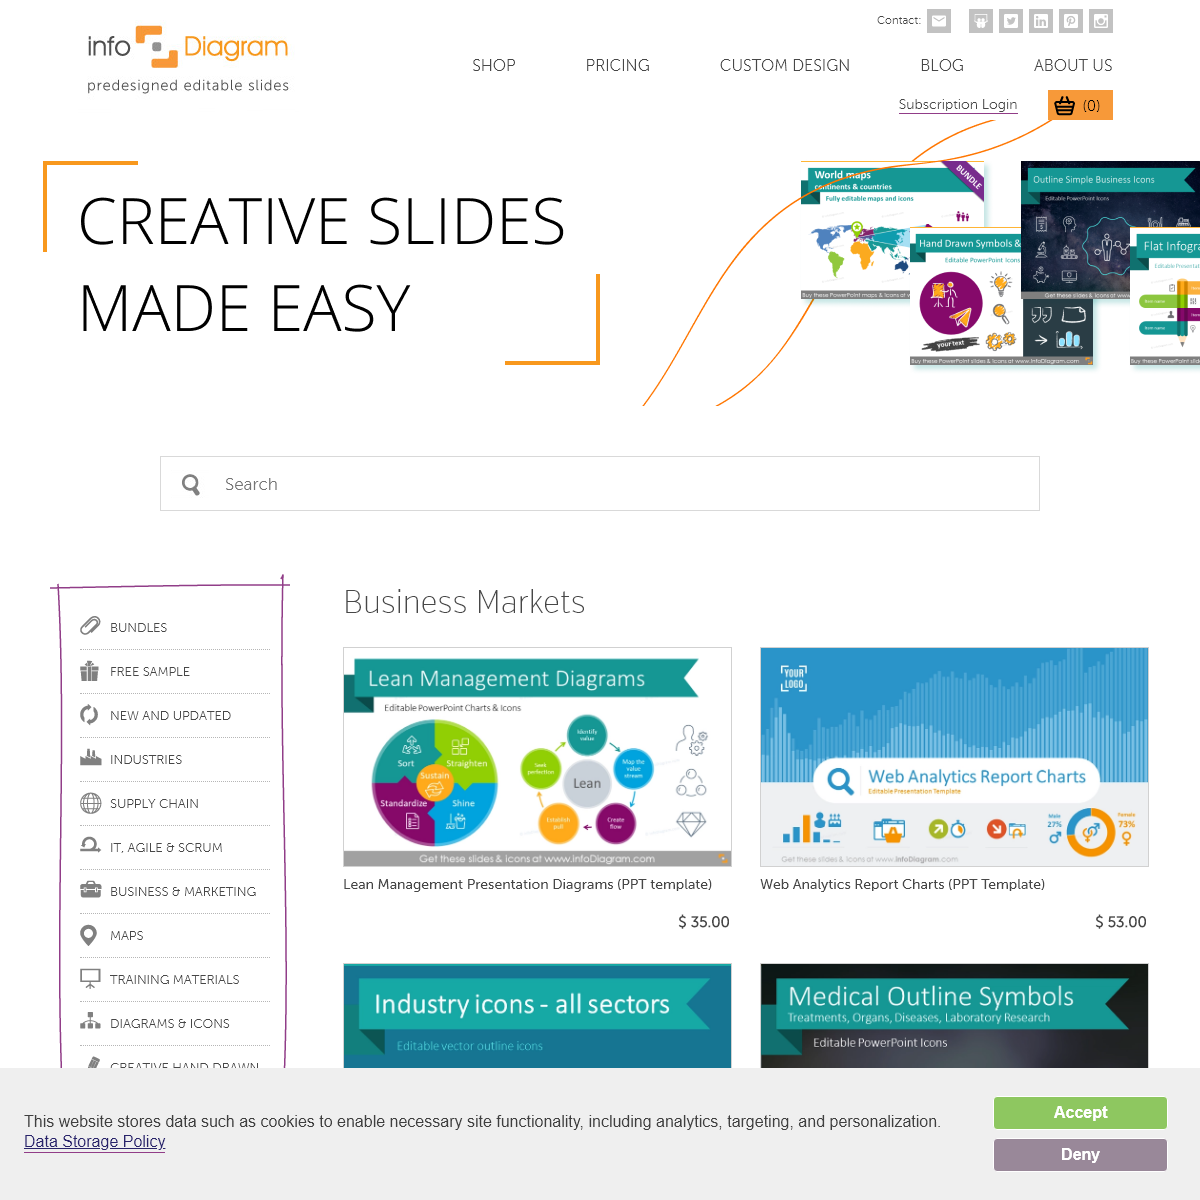 Predesigned presentation slides and graphics - InfoDiagram